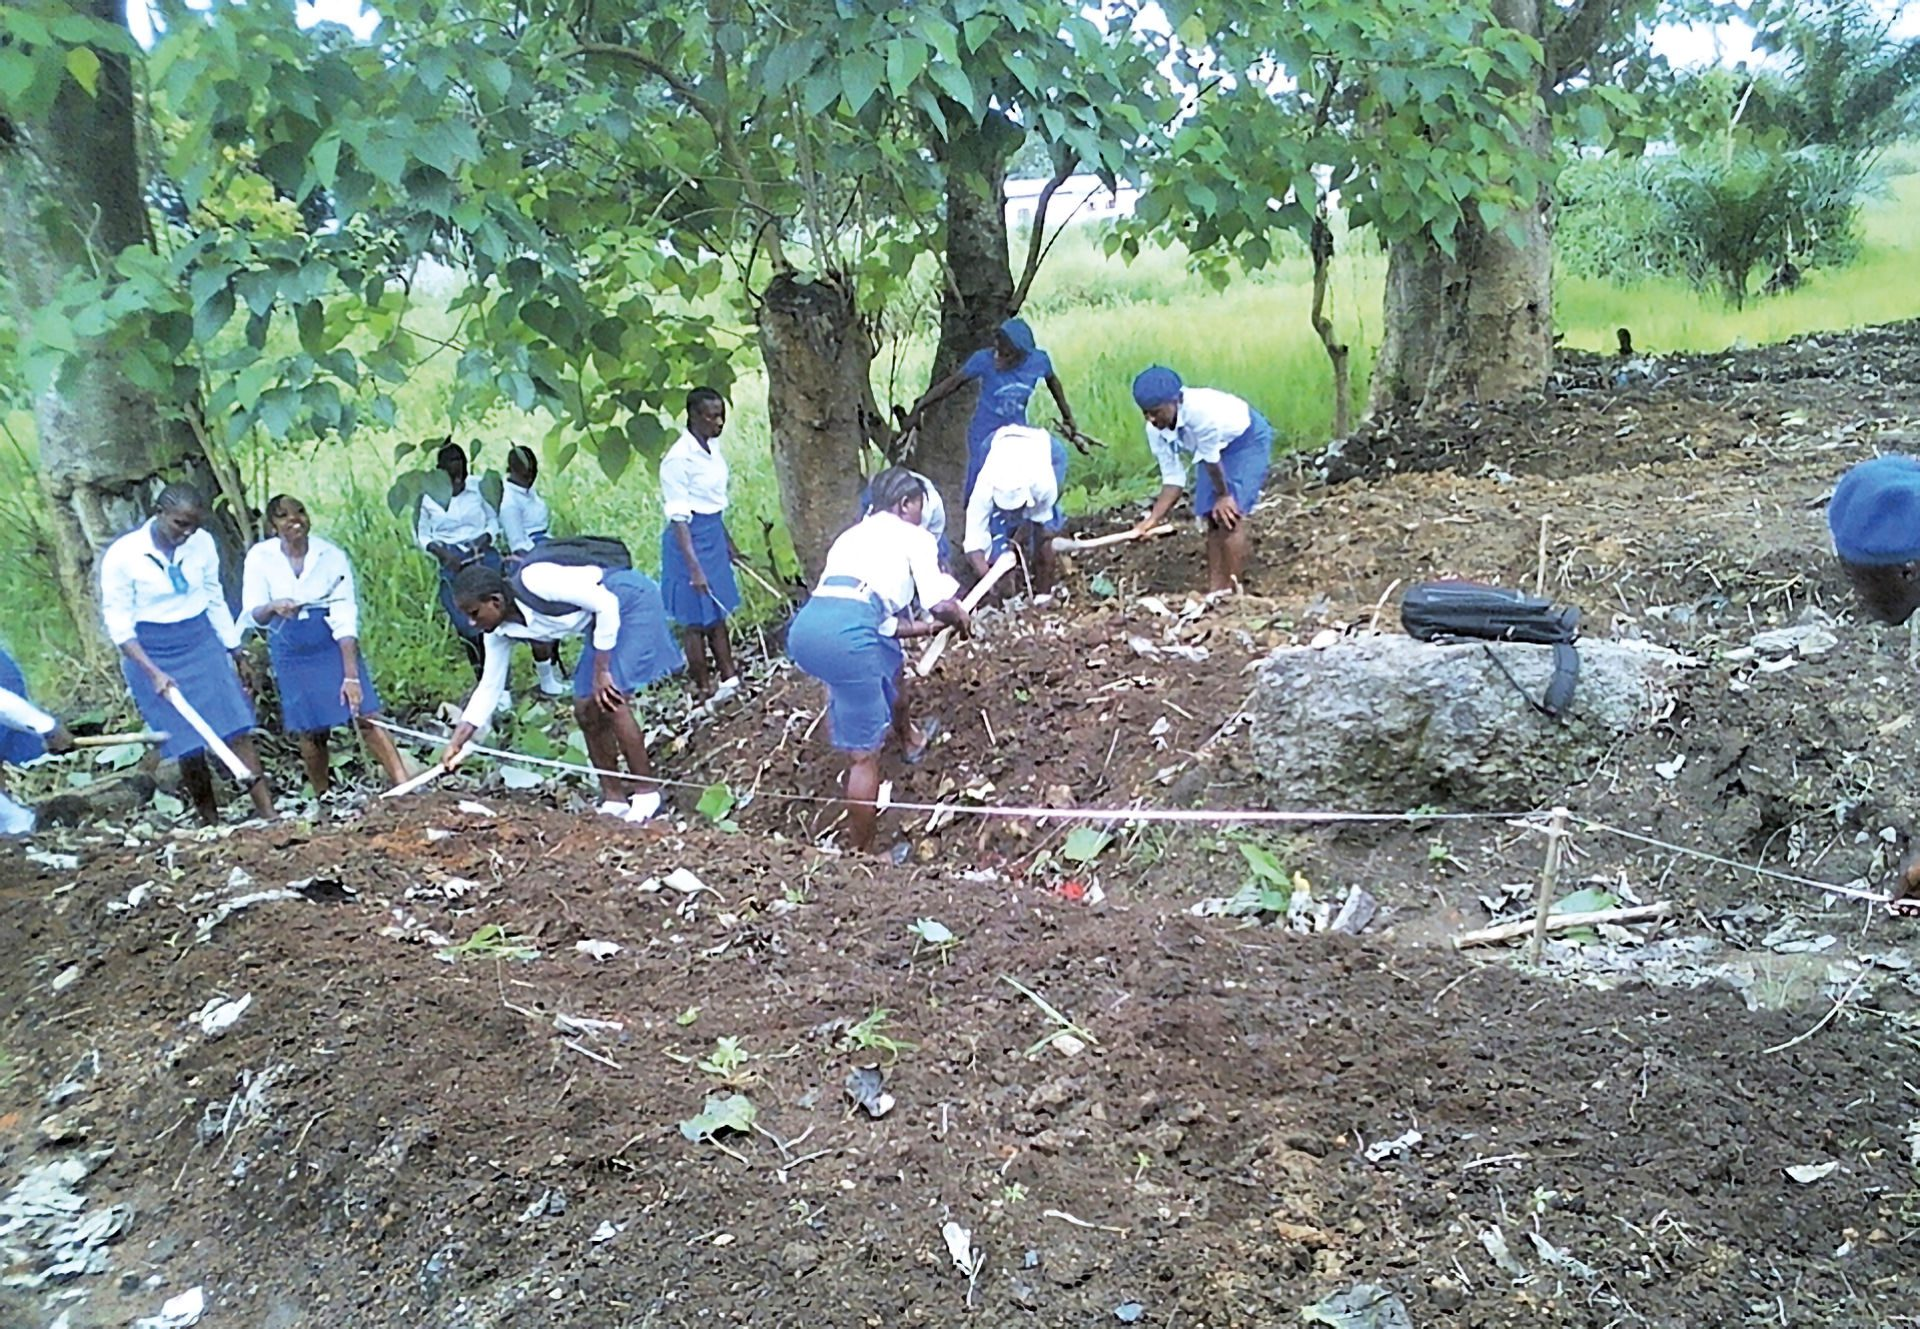 ©FriendsOfTheEnvironment.jpg – Friends of the Environment School Club members in their school garden at one of the member schools.